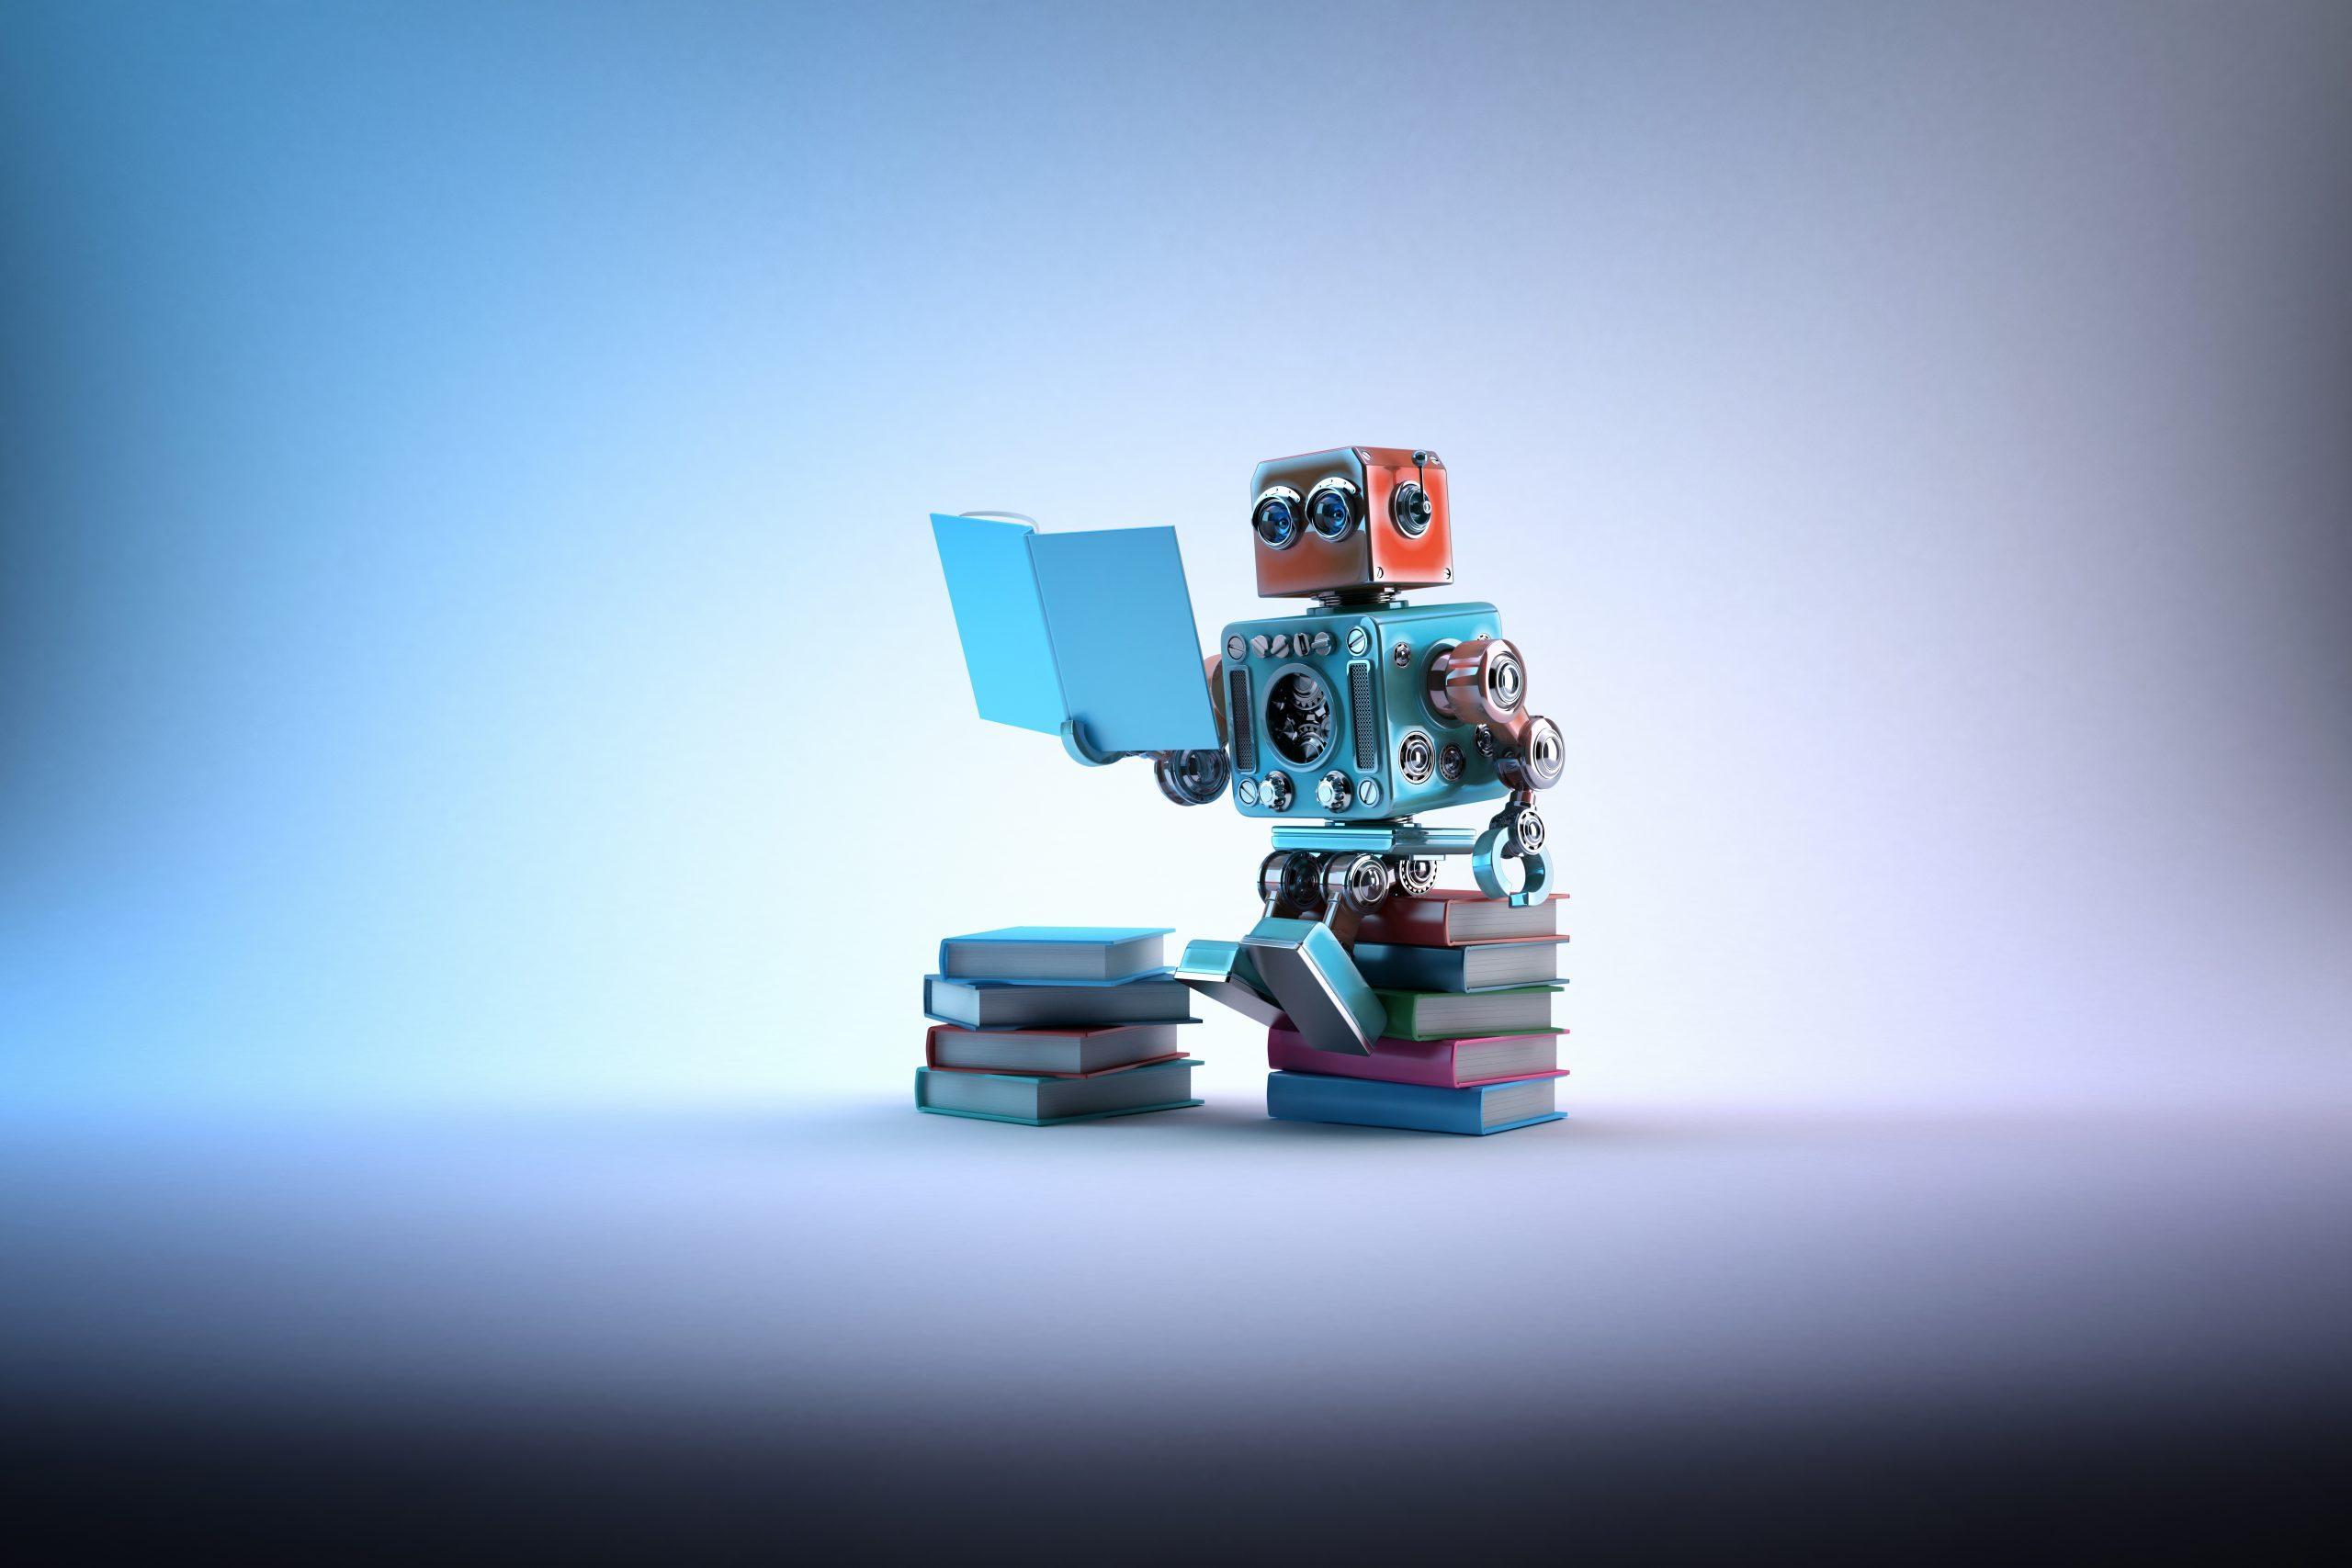 https://depositphotos.com/90806746/stock-photo-robot-sitting-on-a-bunch.html